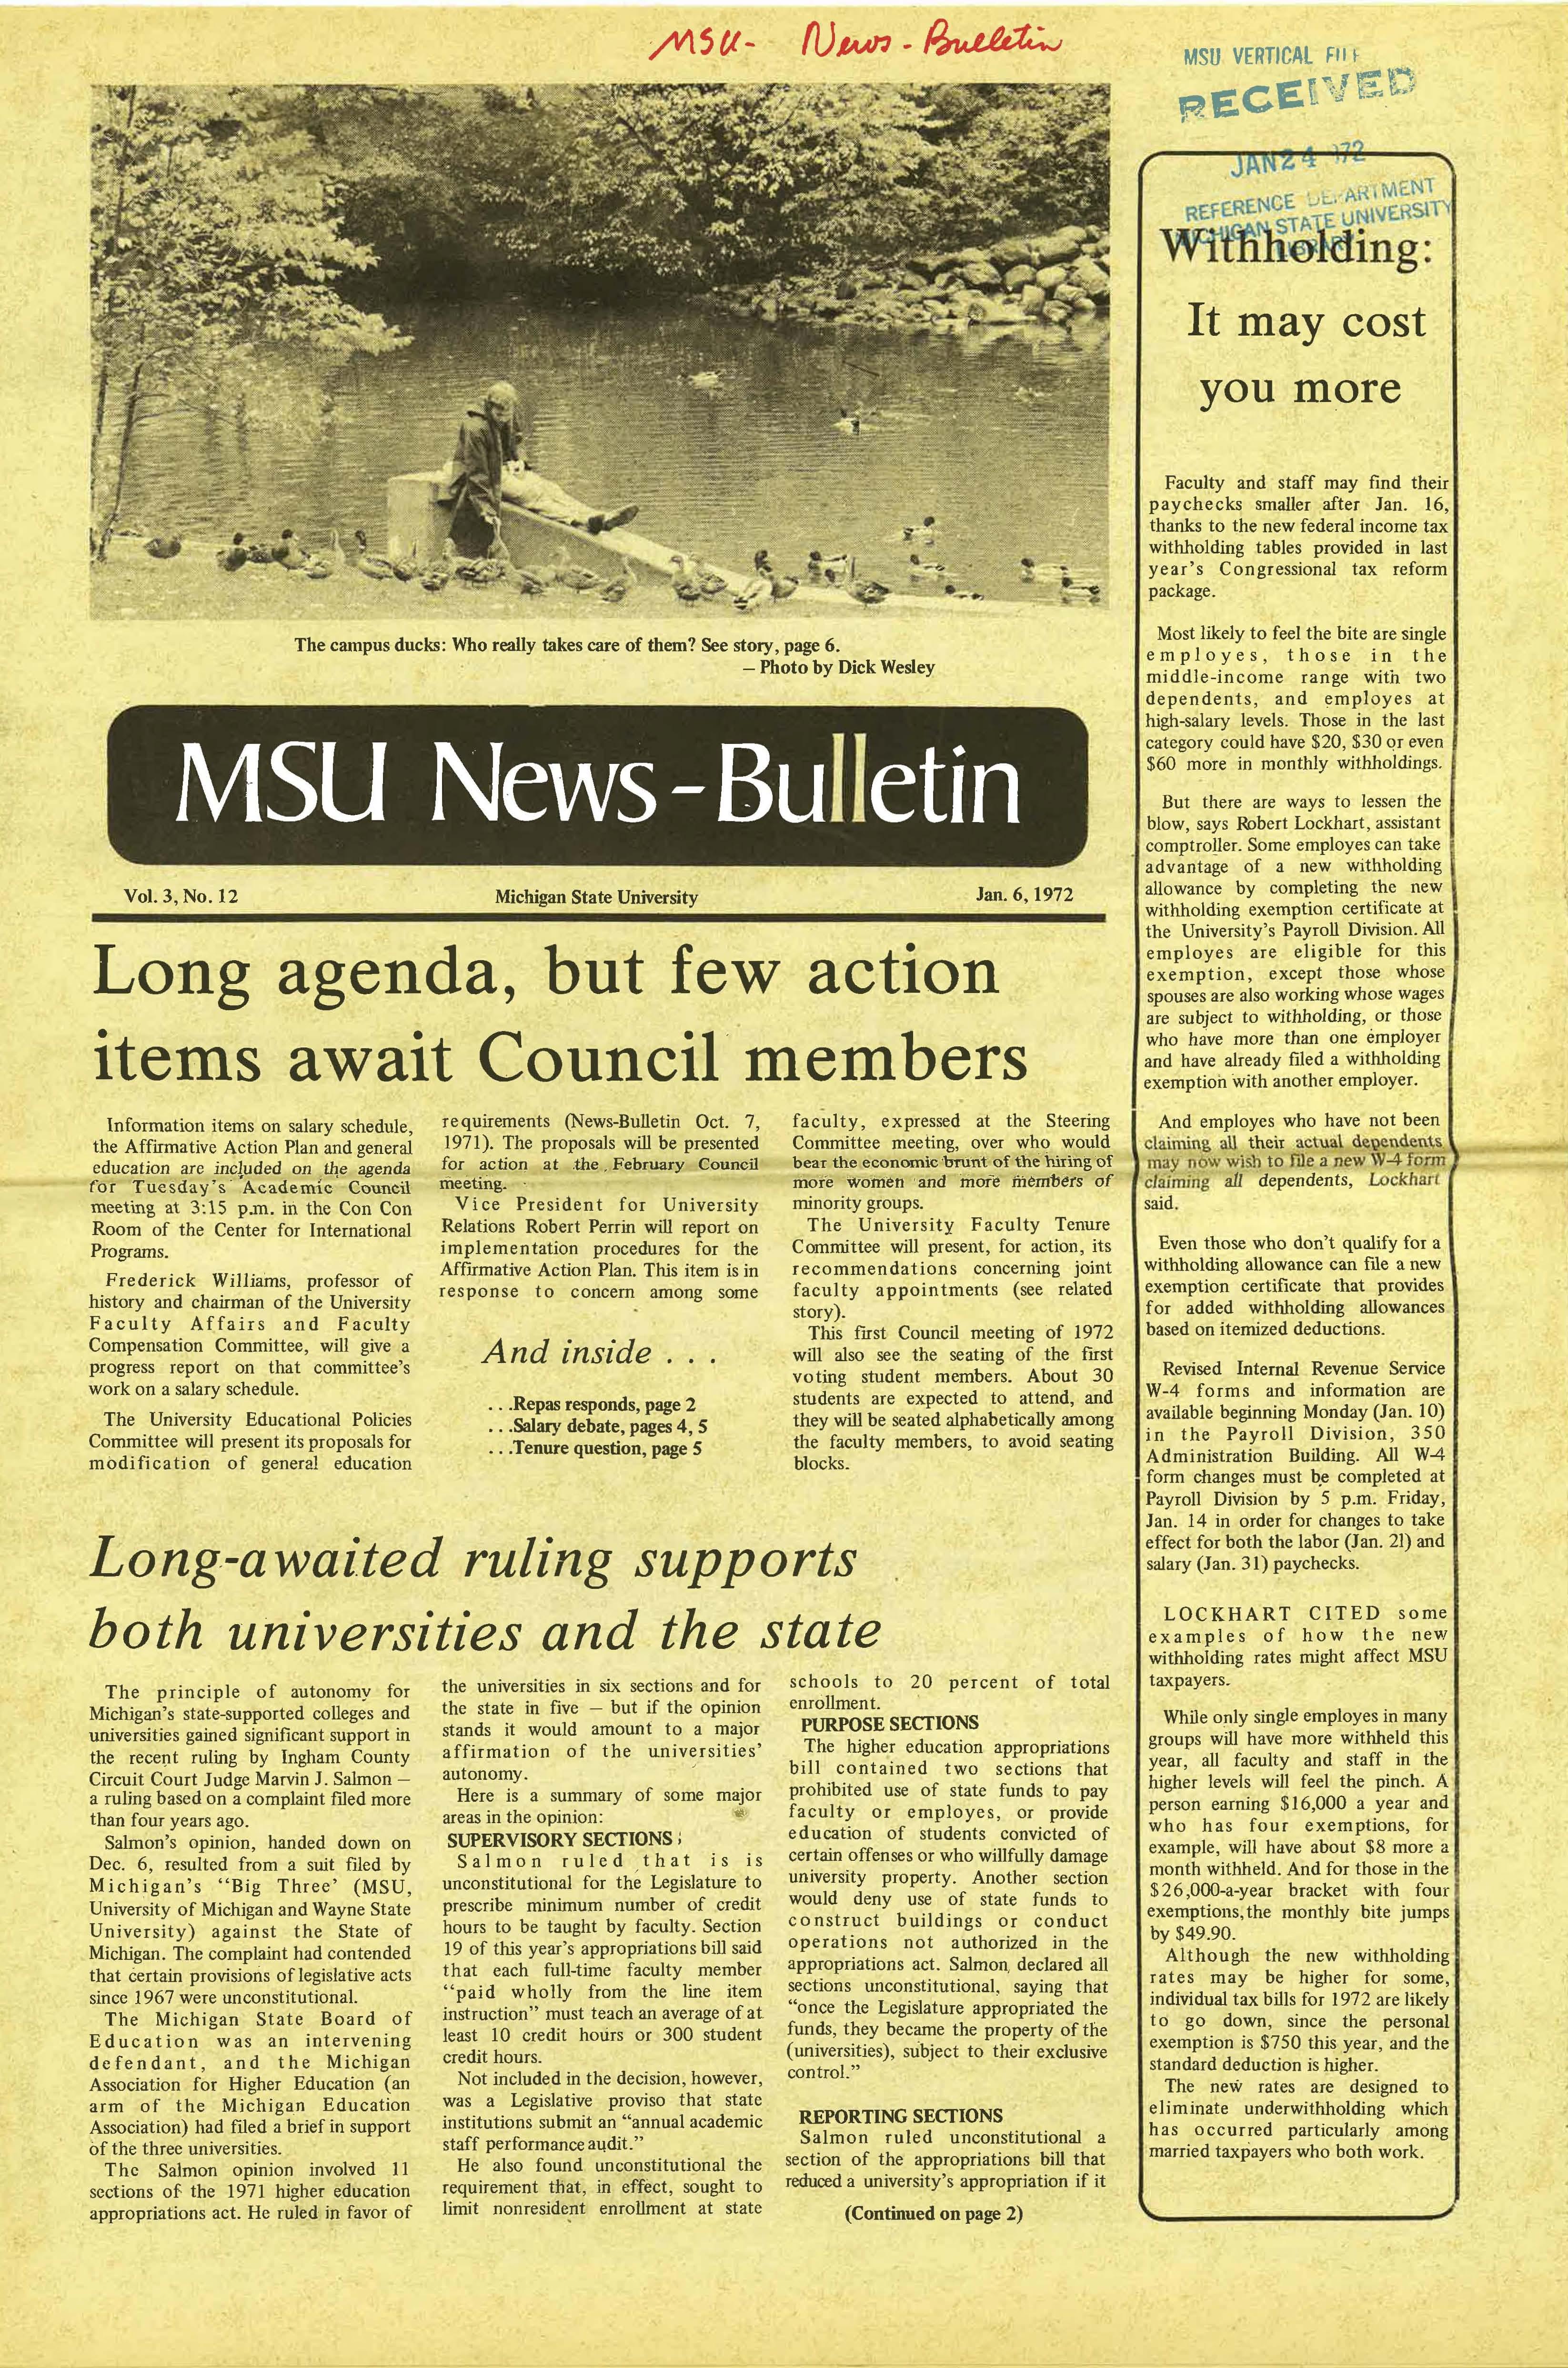 MSU News Bulletin, vol. 4, No. 07, November 2, 1972